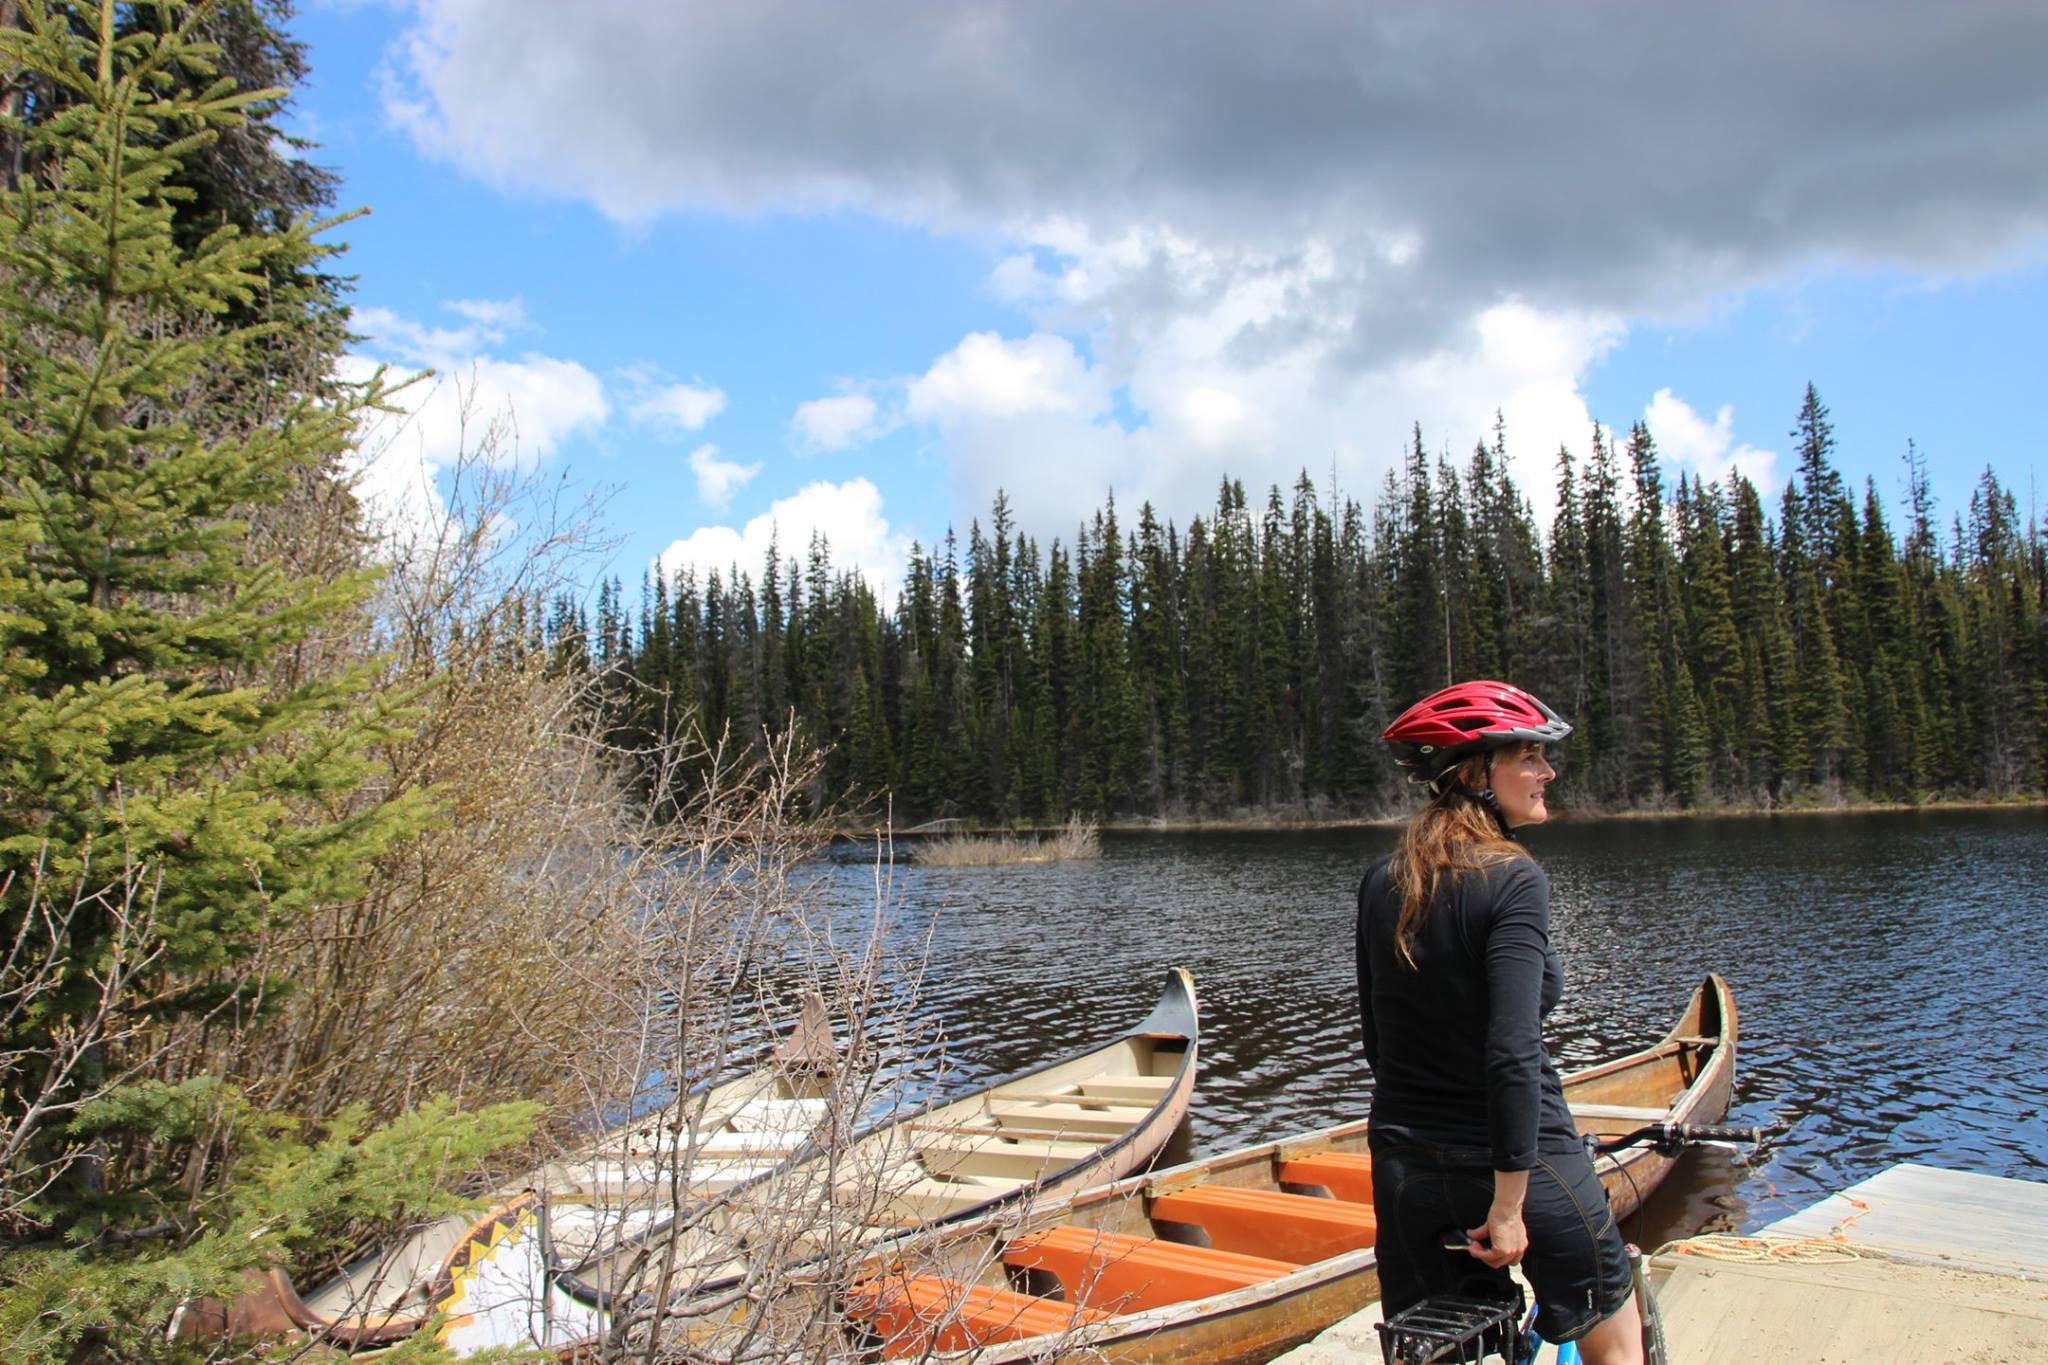 McGillivray Lake - Voyageur canoes and mountain bike ride